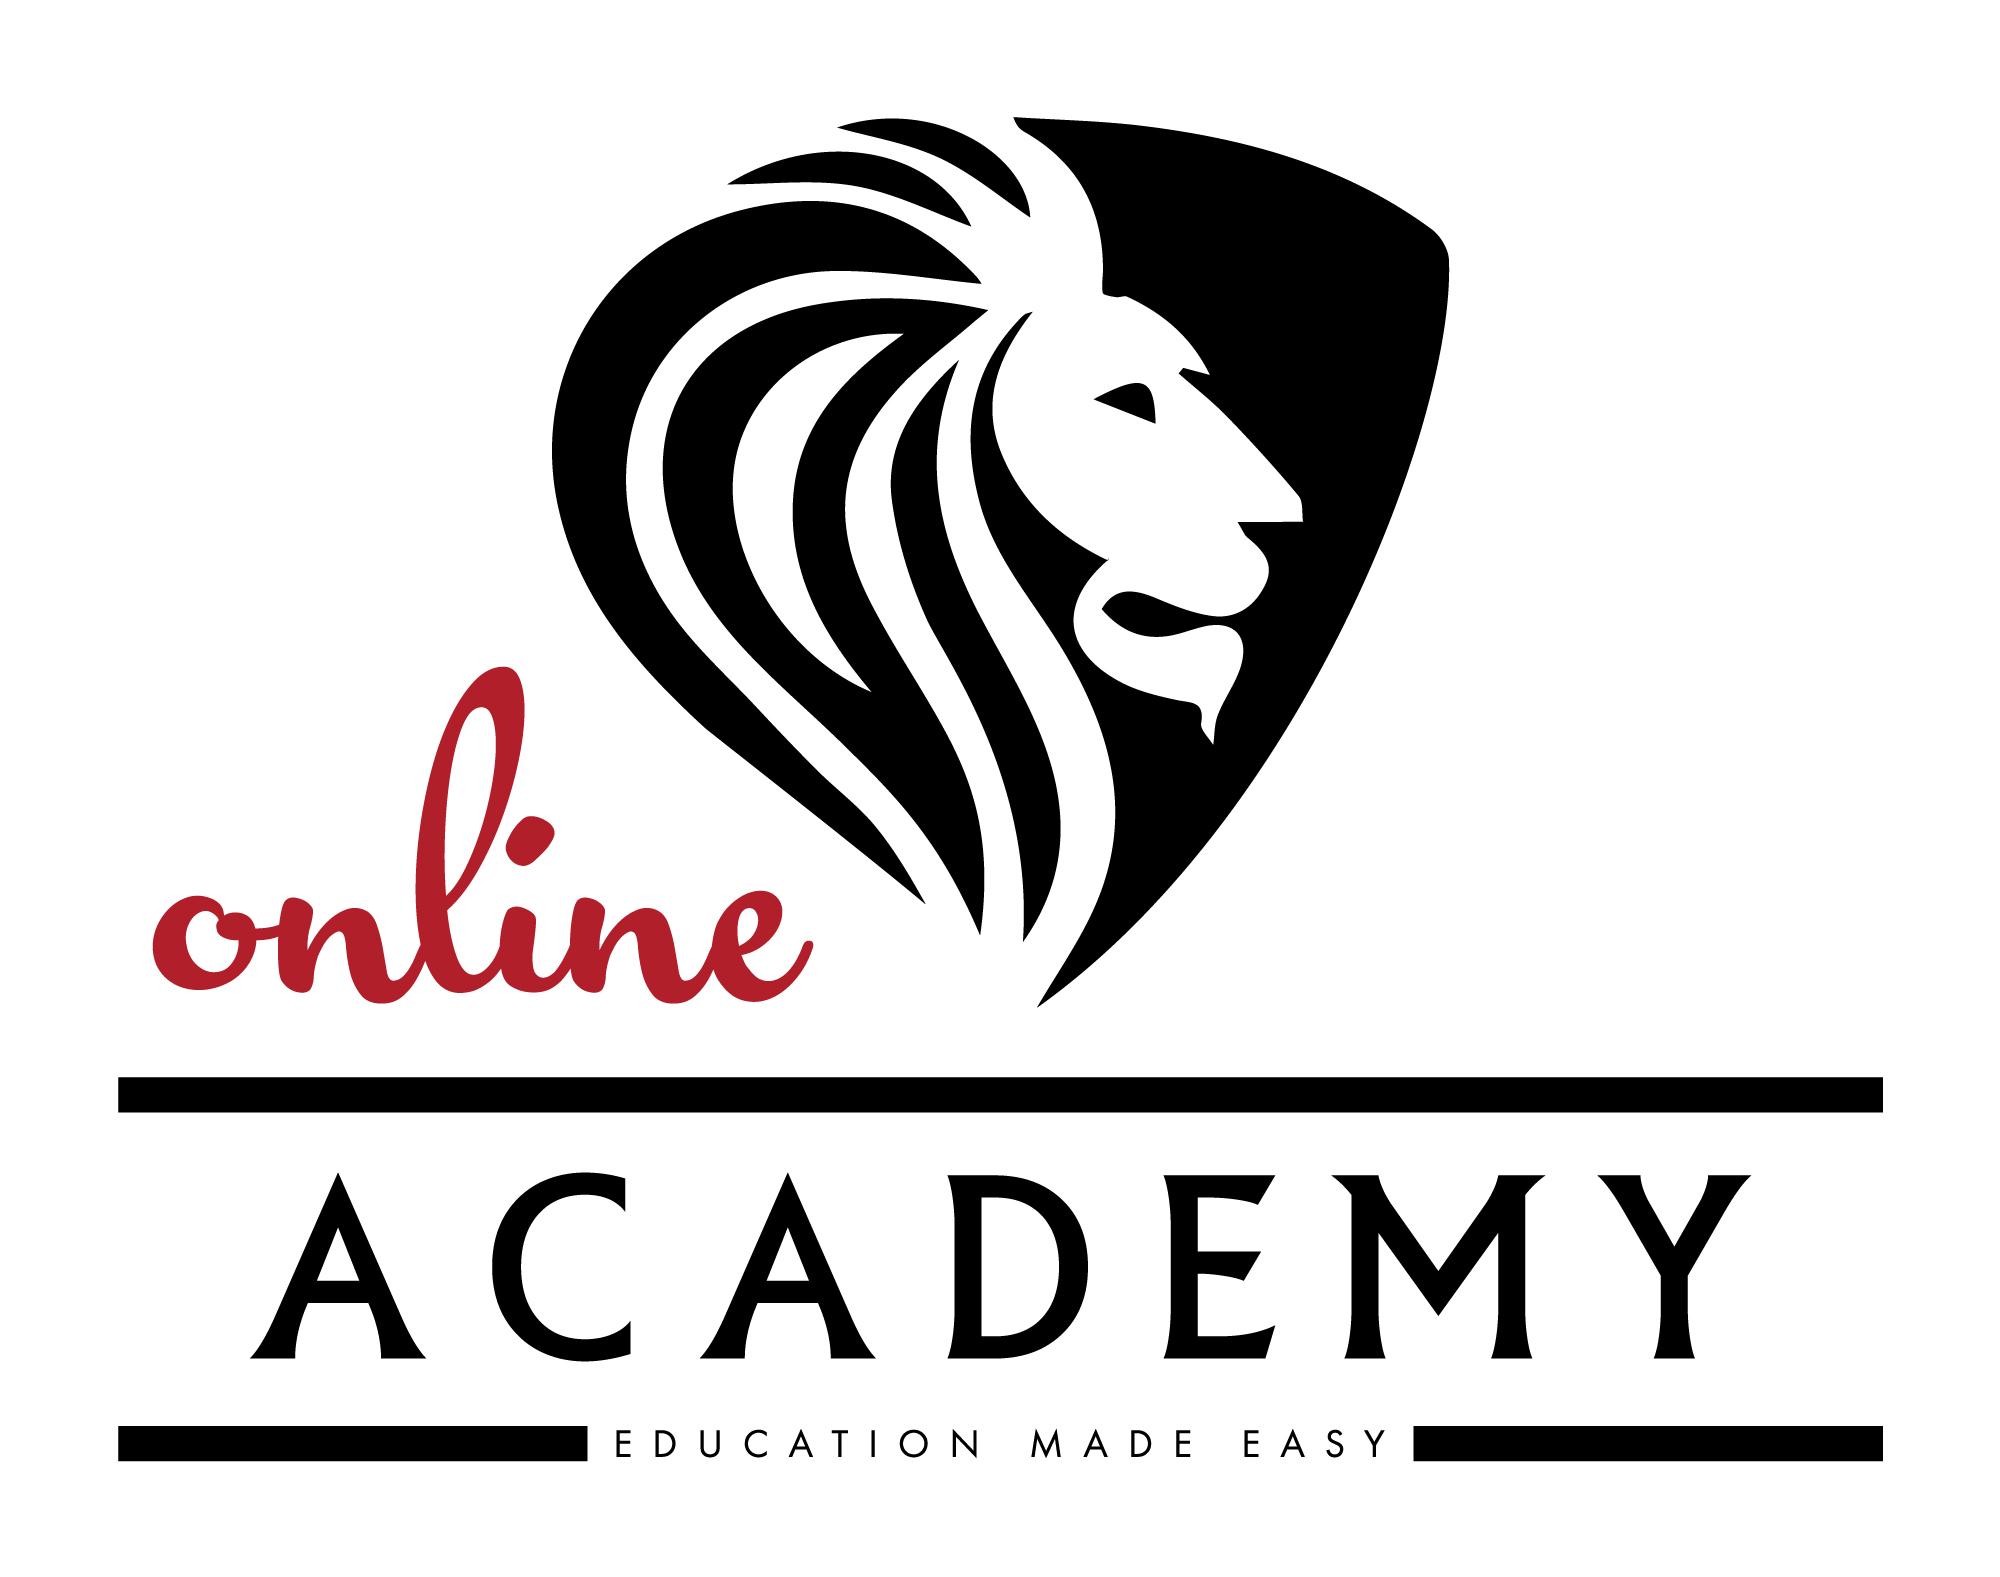 https://www.utbildningssidan.se/utbildning/certifierad-feng-shui-konsult-academy-online